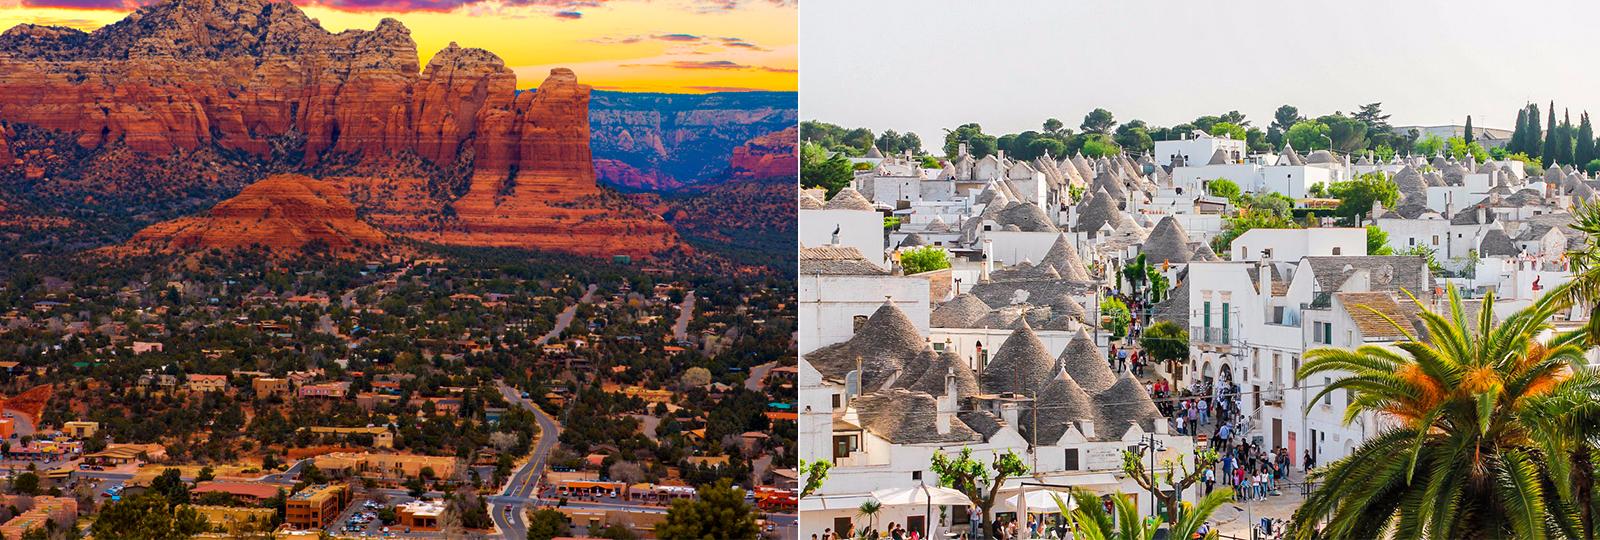 5 pequenas cidades para viver grandes experiências